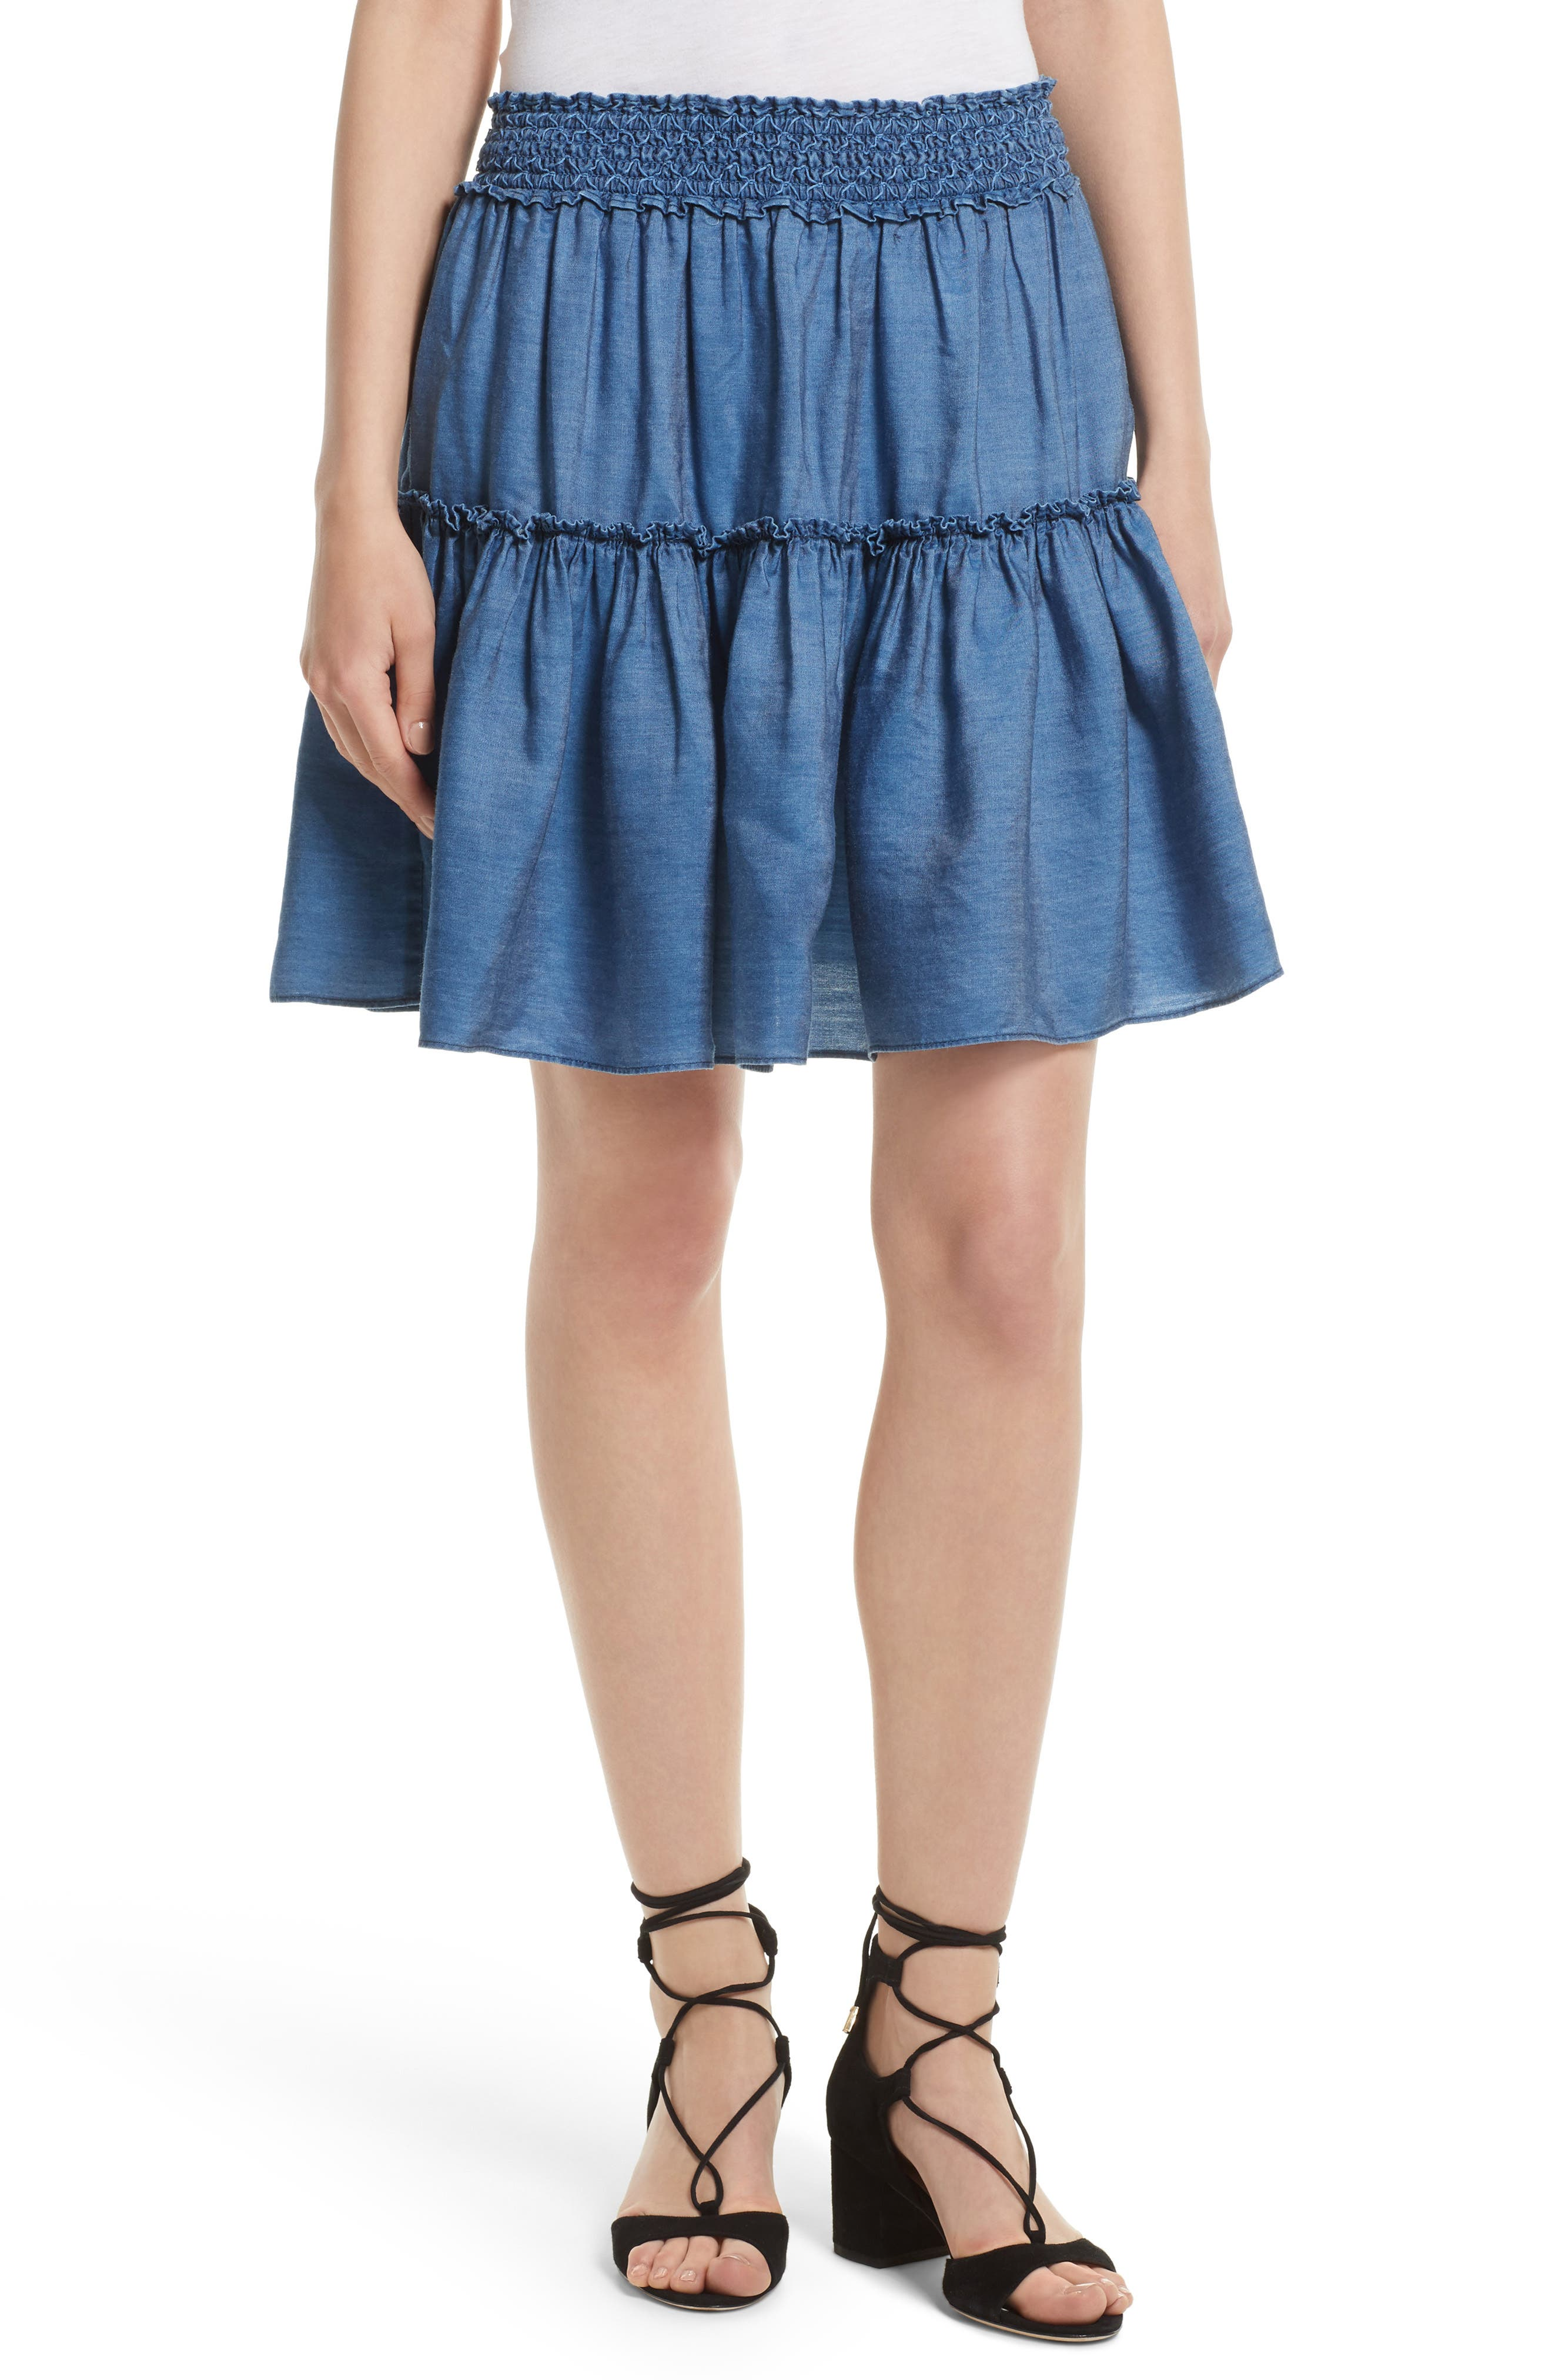 KATE SPADE NEW YORK smocked waist chambray skirt